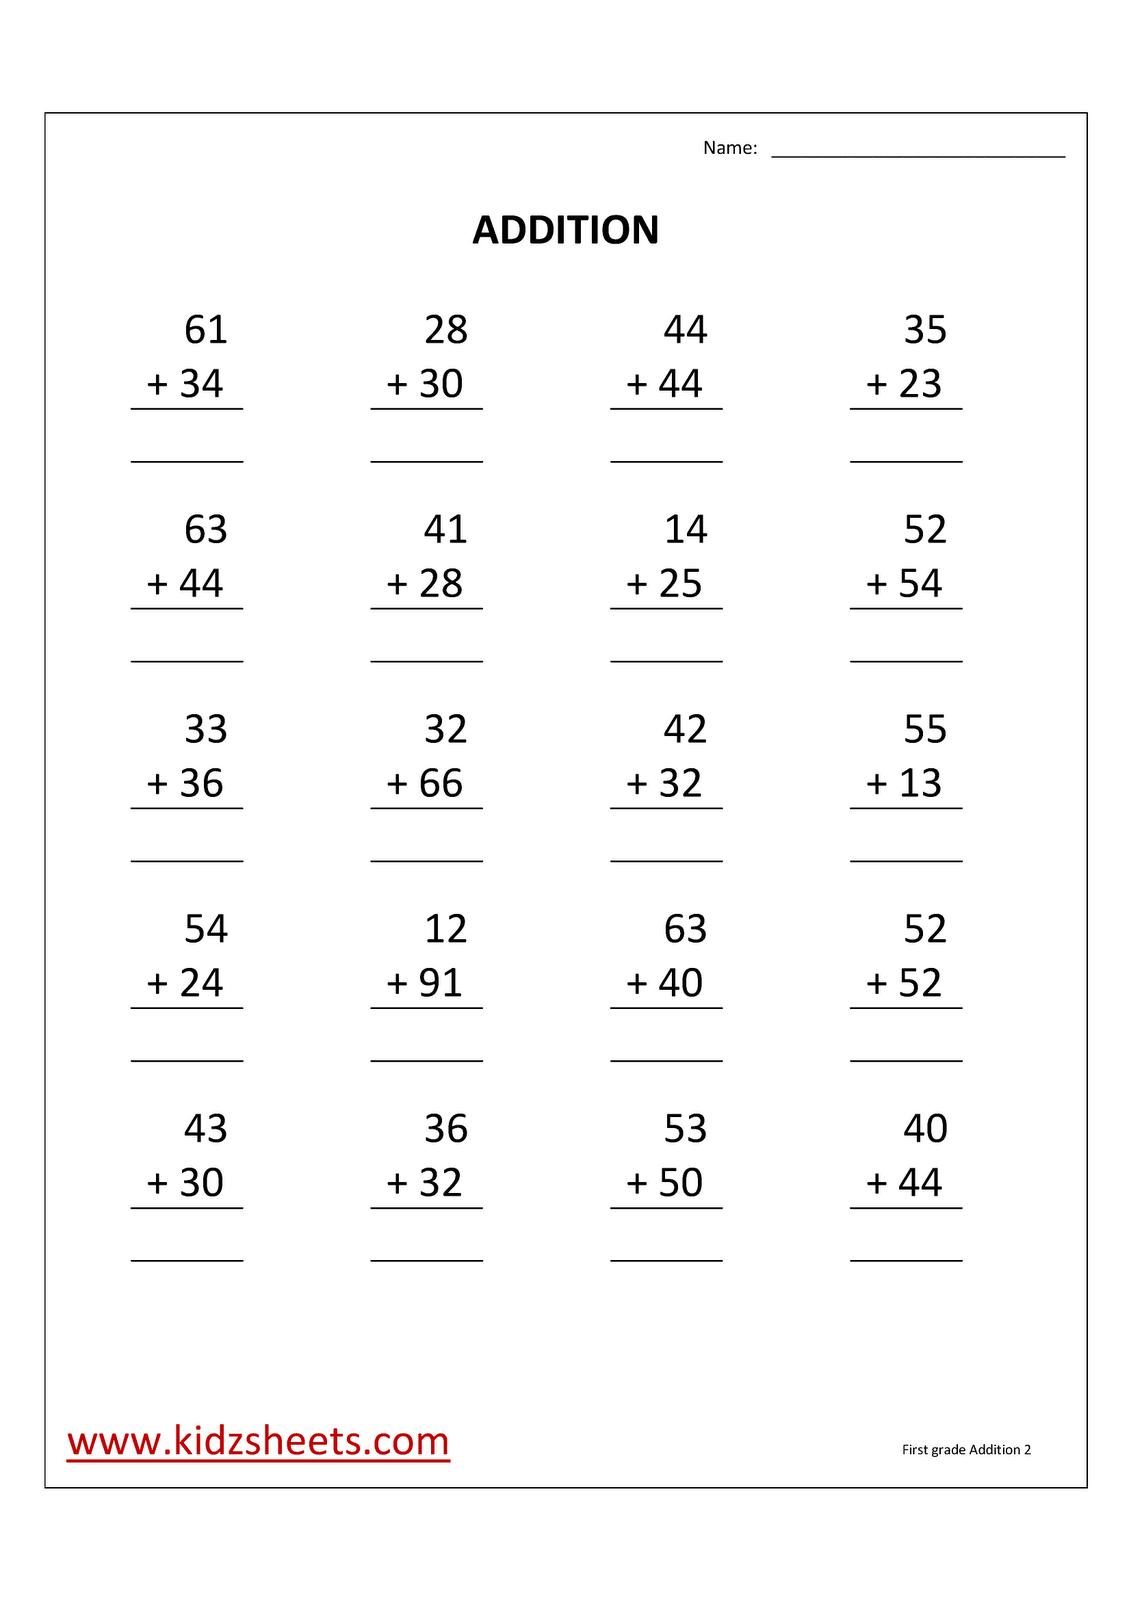 Kidz Worksheets: First Grade Addition Worksheet2